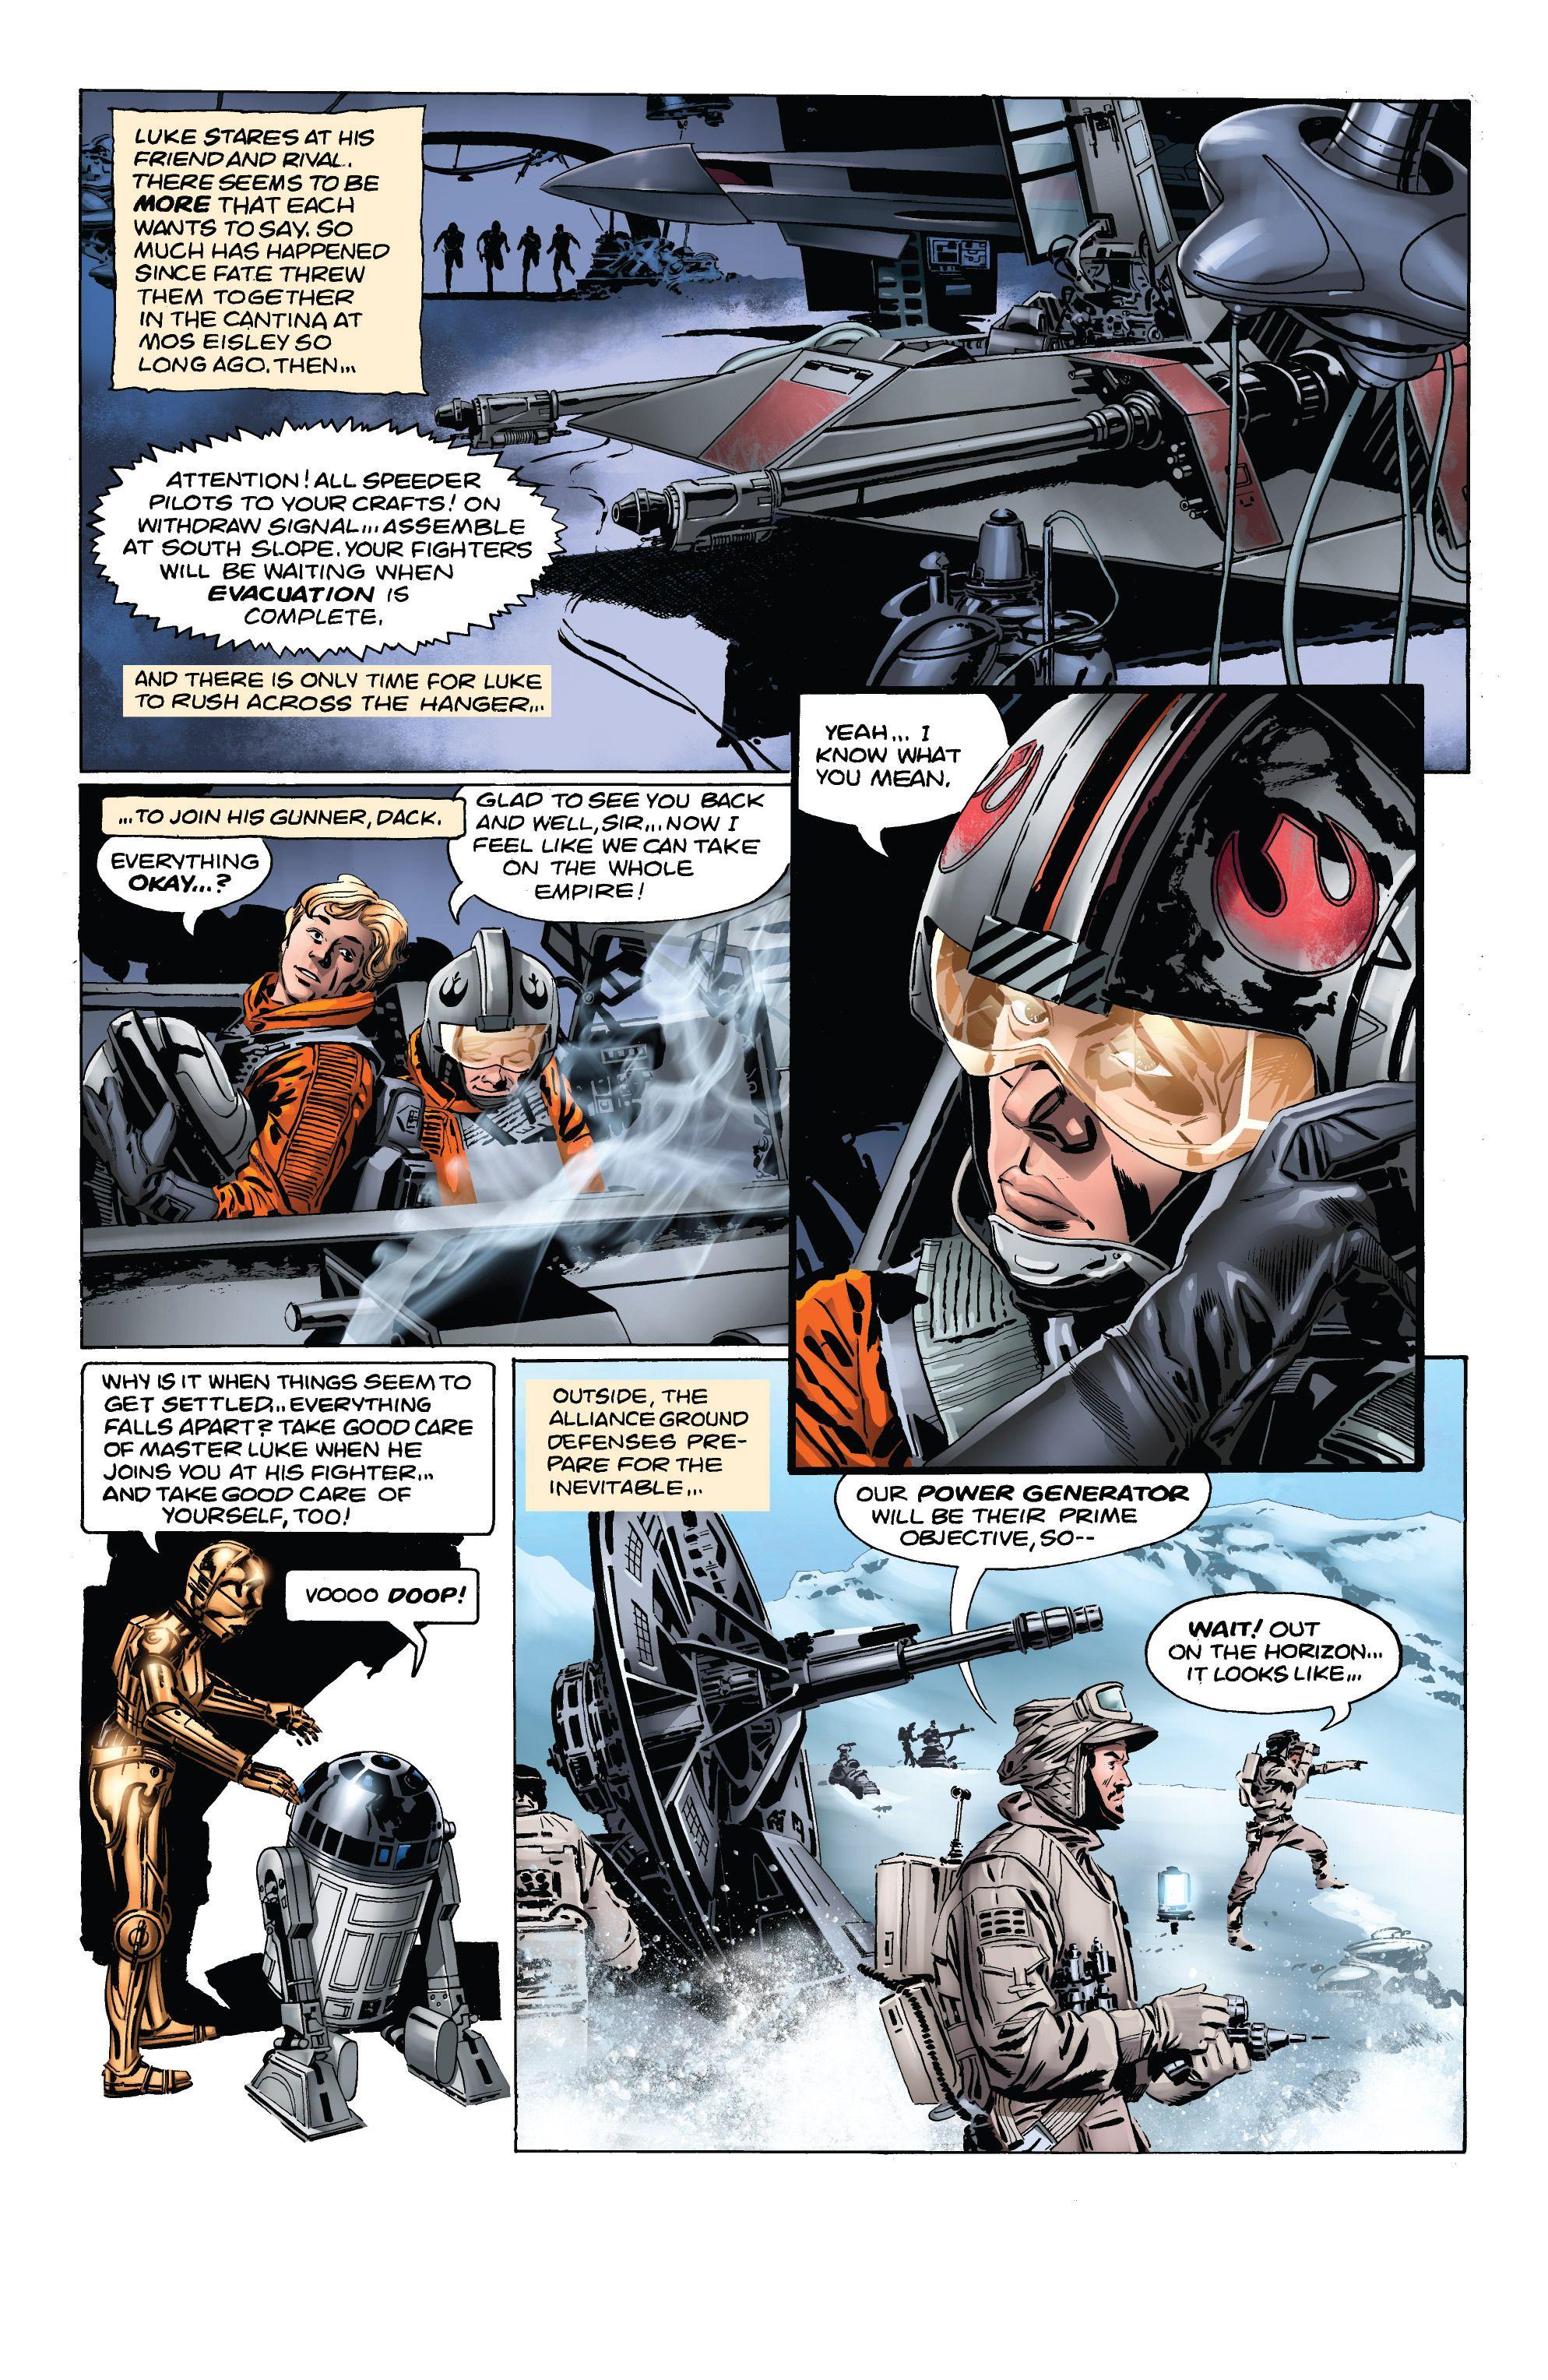 Star Wars Episode V The Empire Strikes Back Remastered 2015